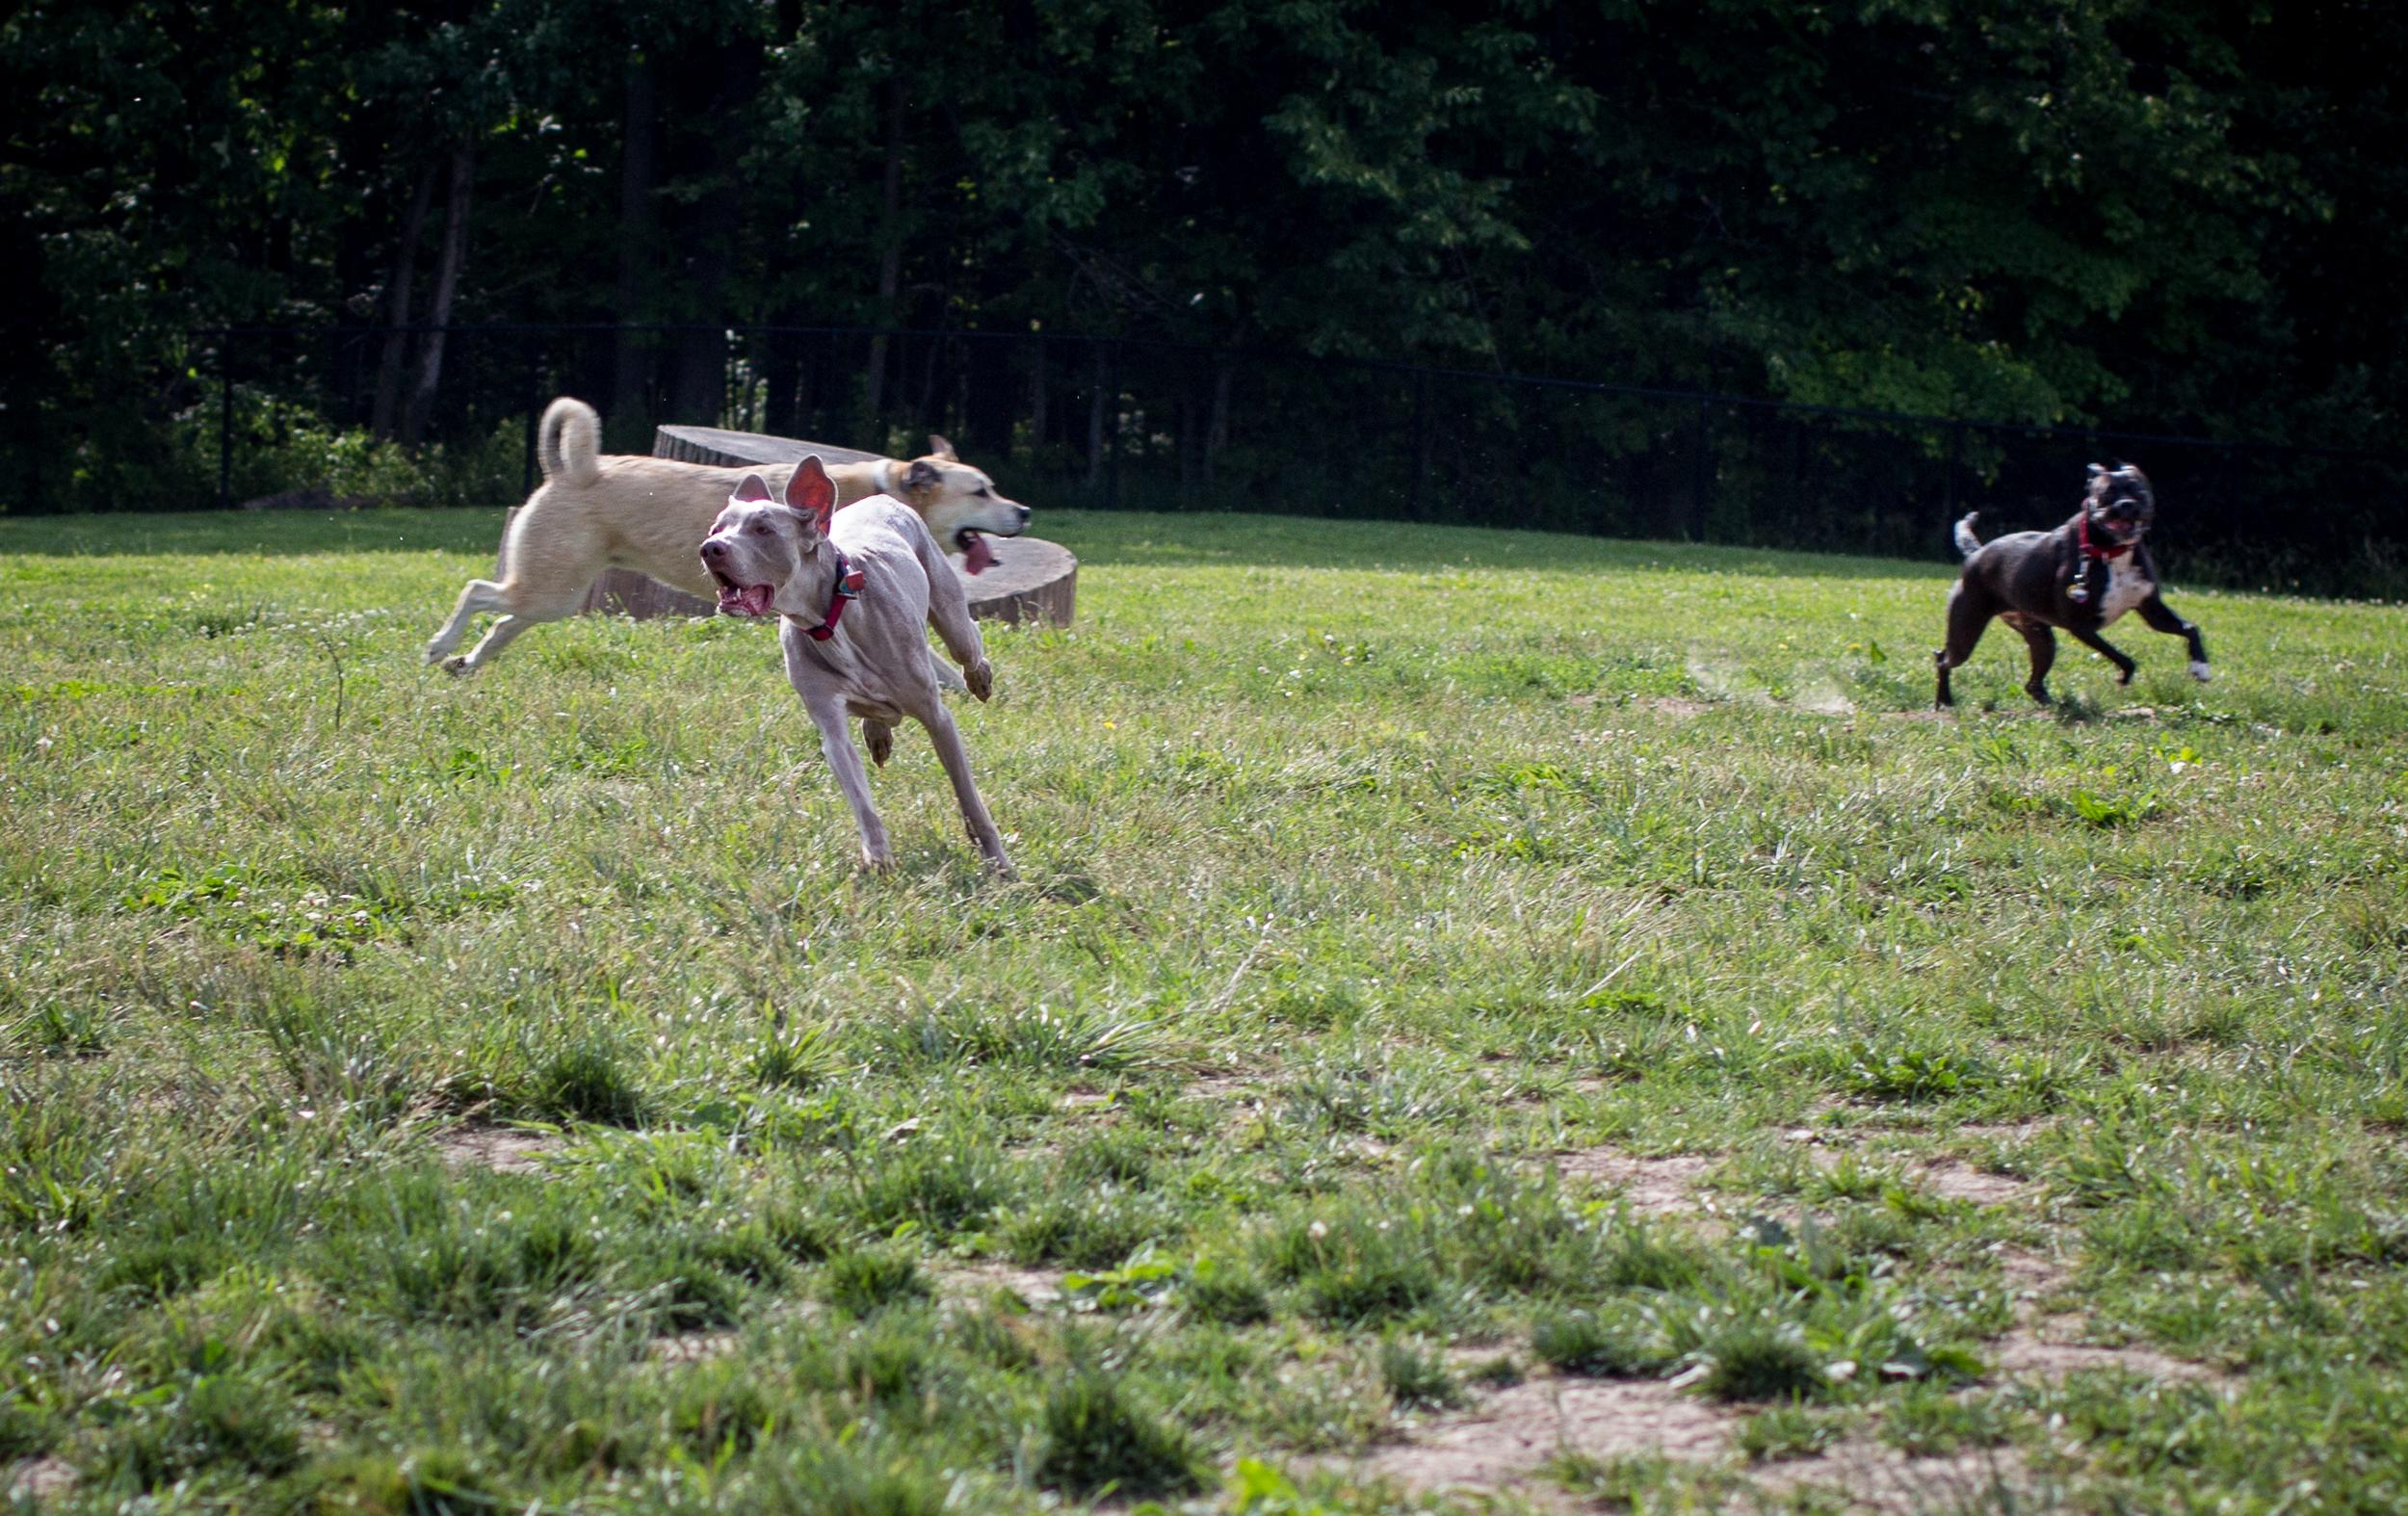 Lacey_dogpark_061817-5.jpg